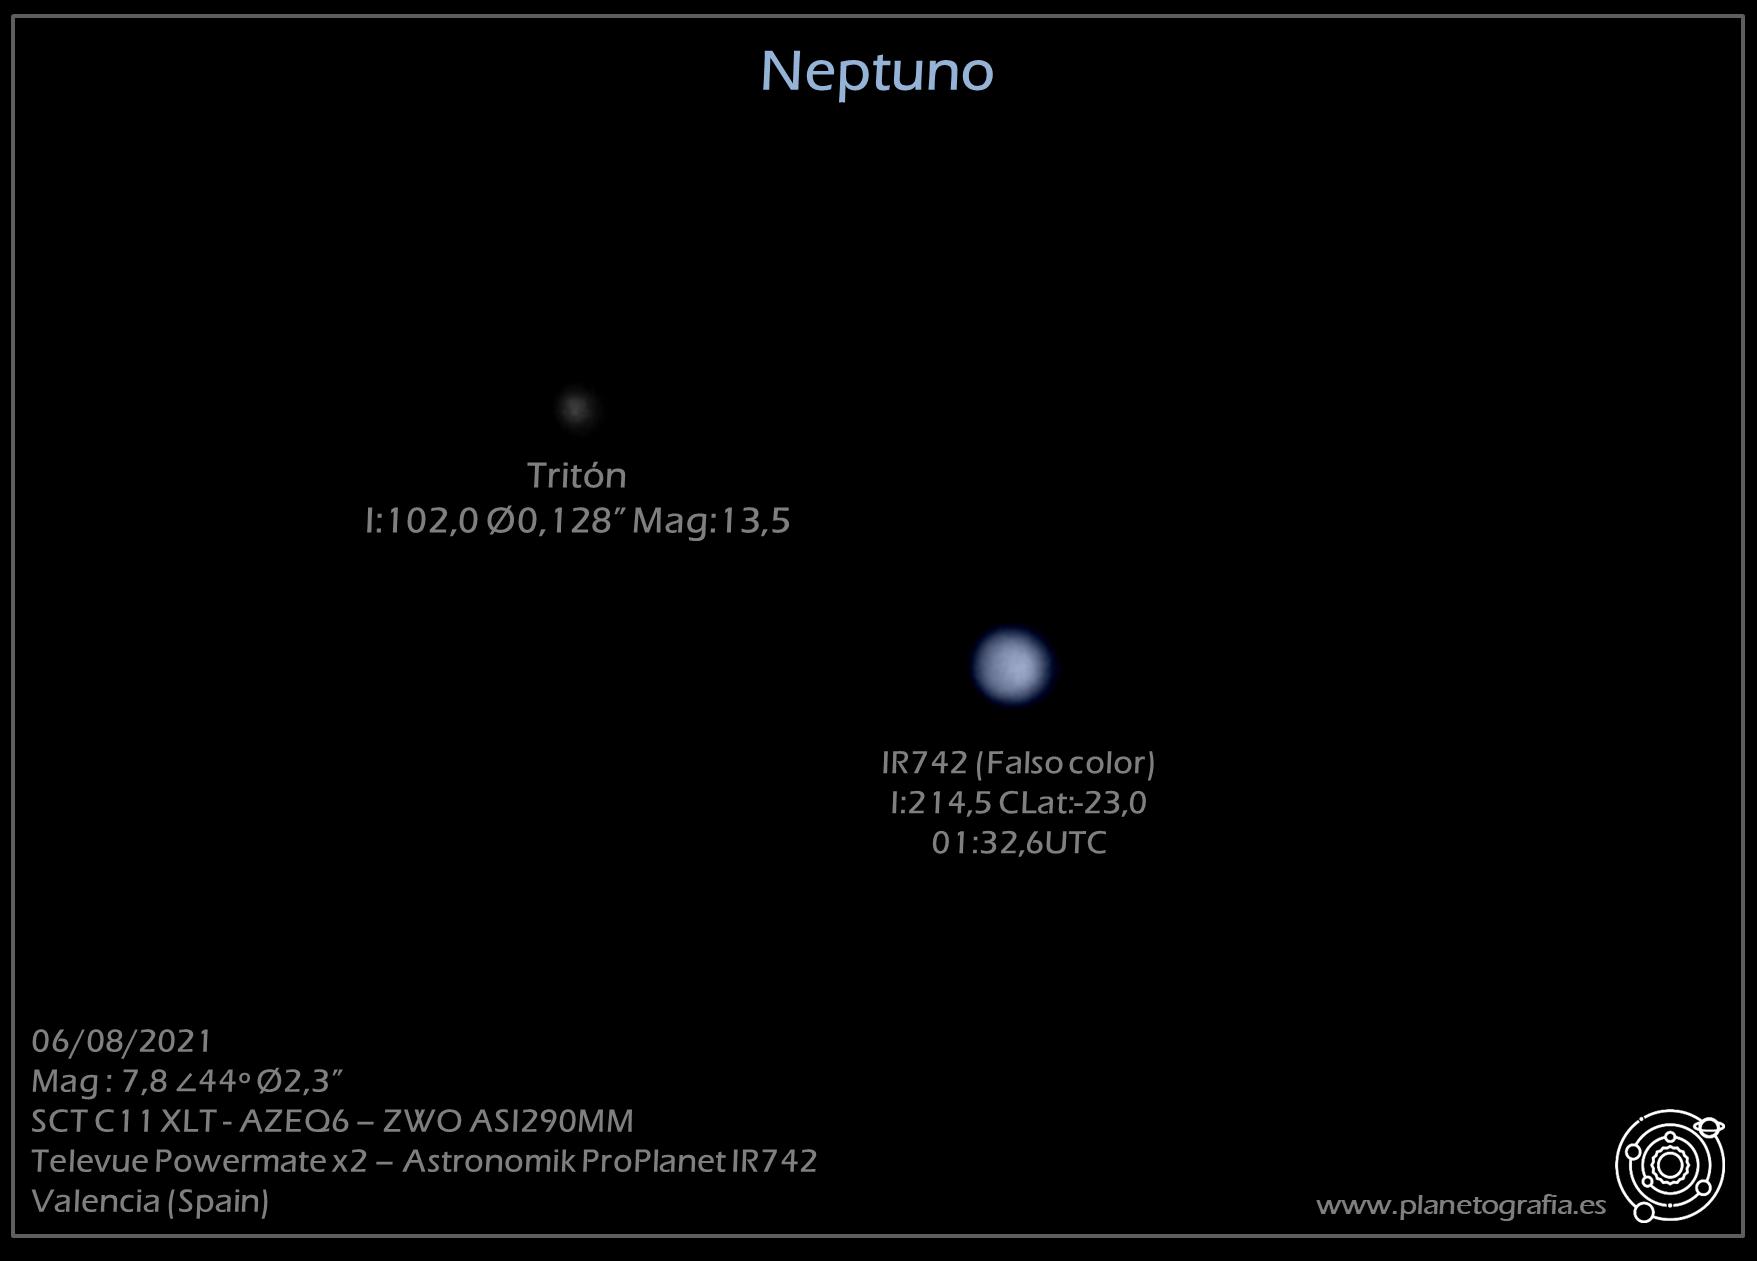 astrofotografia planetaria triton neptuno